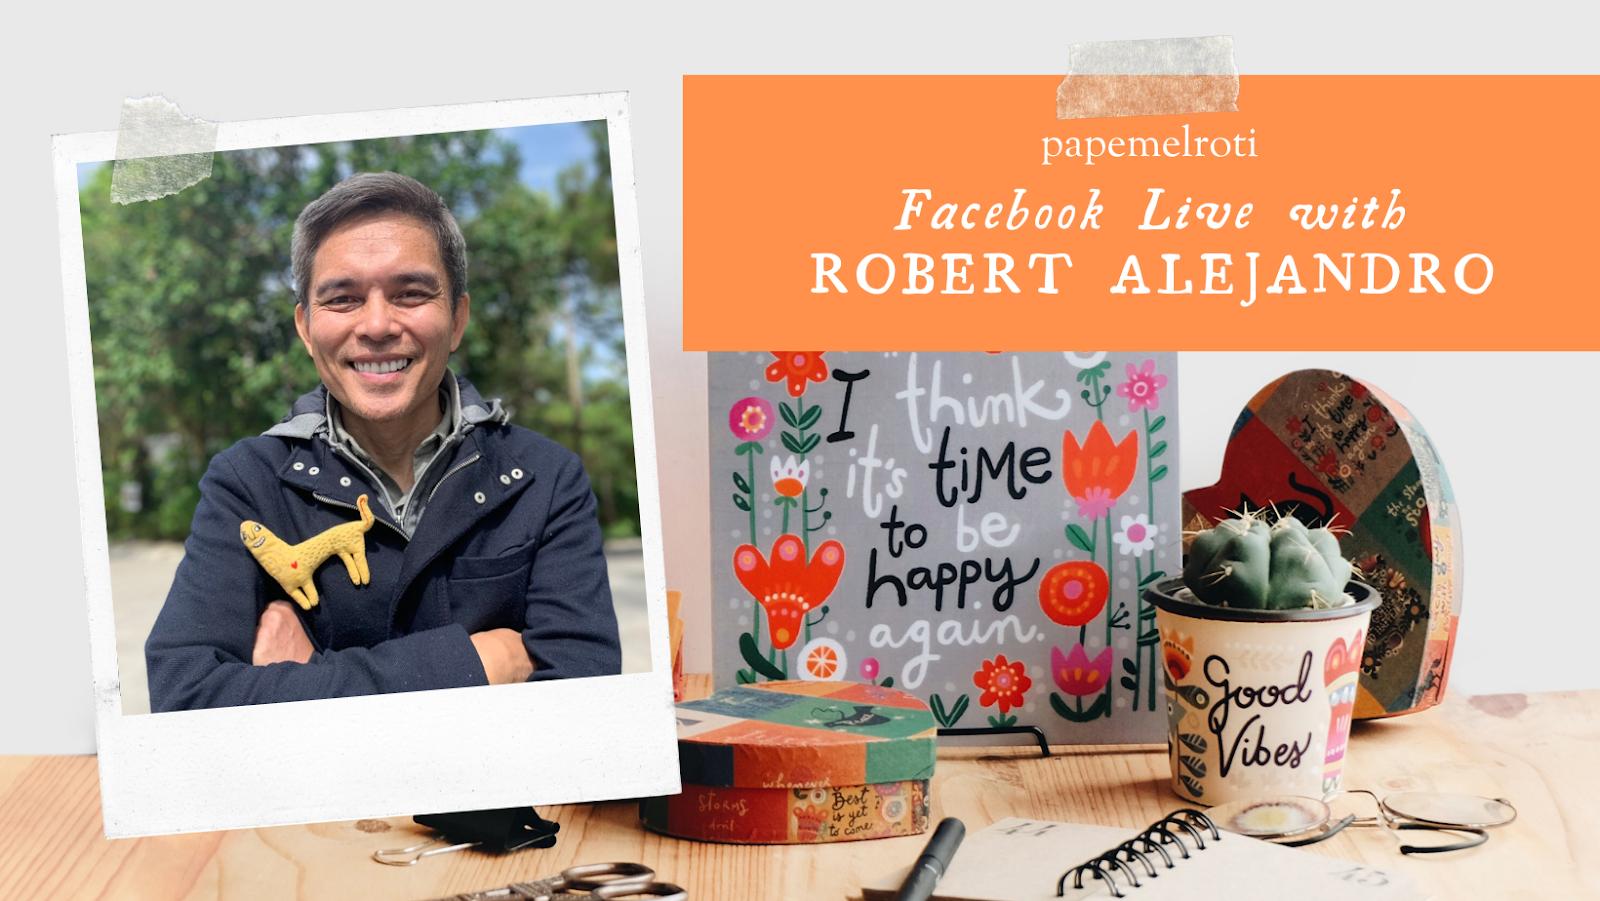 Papemelroti   Facebook Live with Robert Alejandro